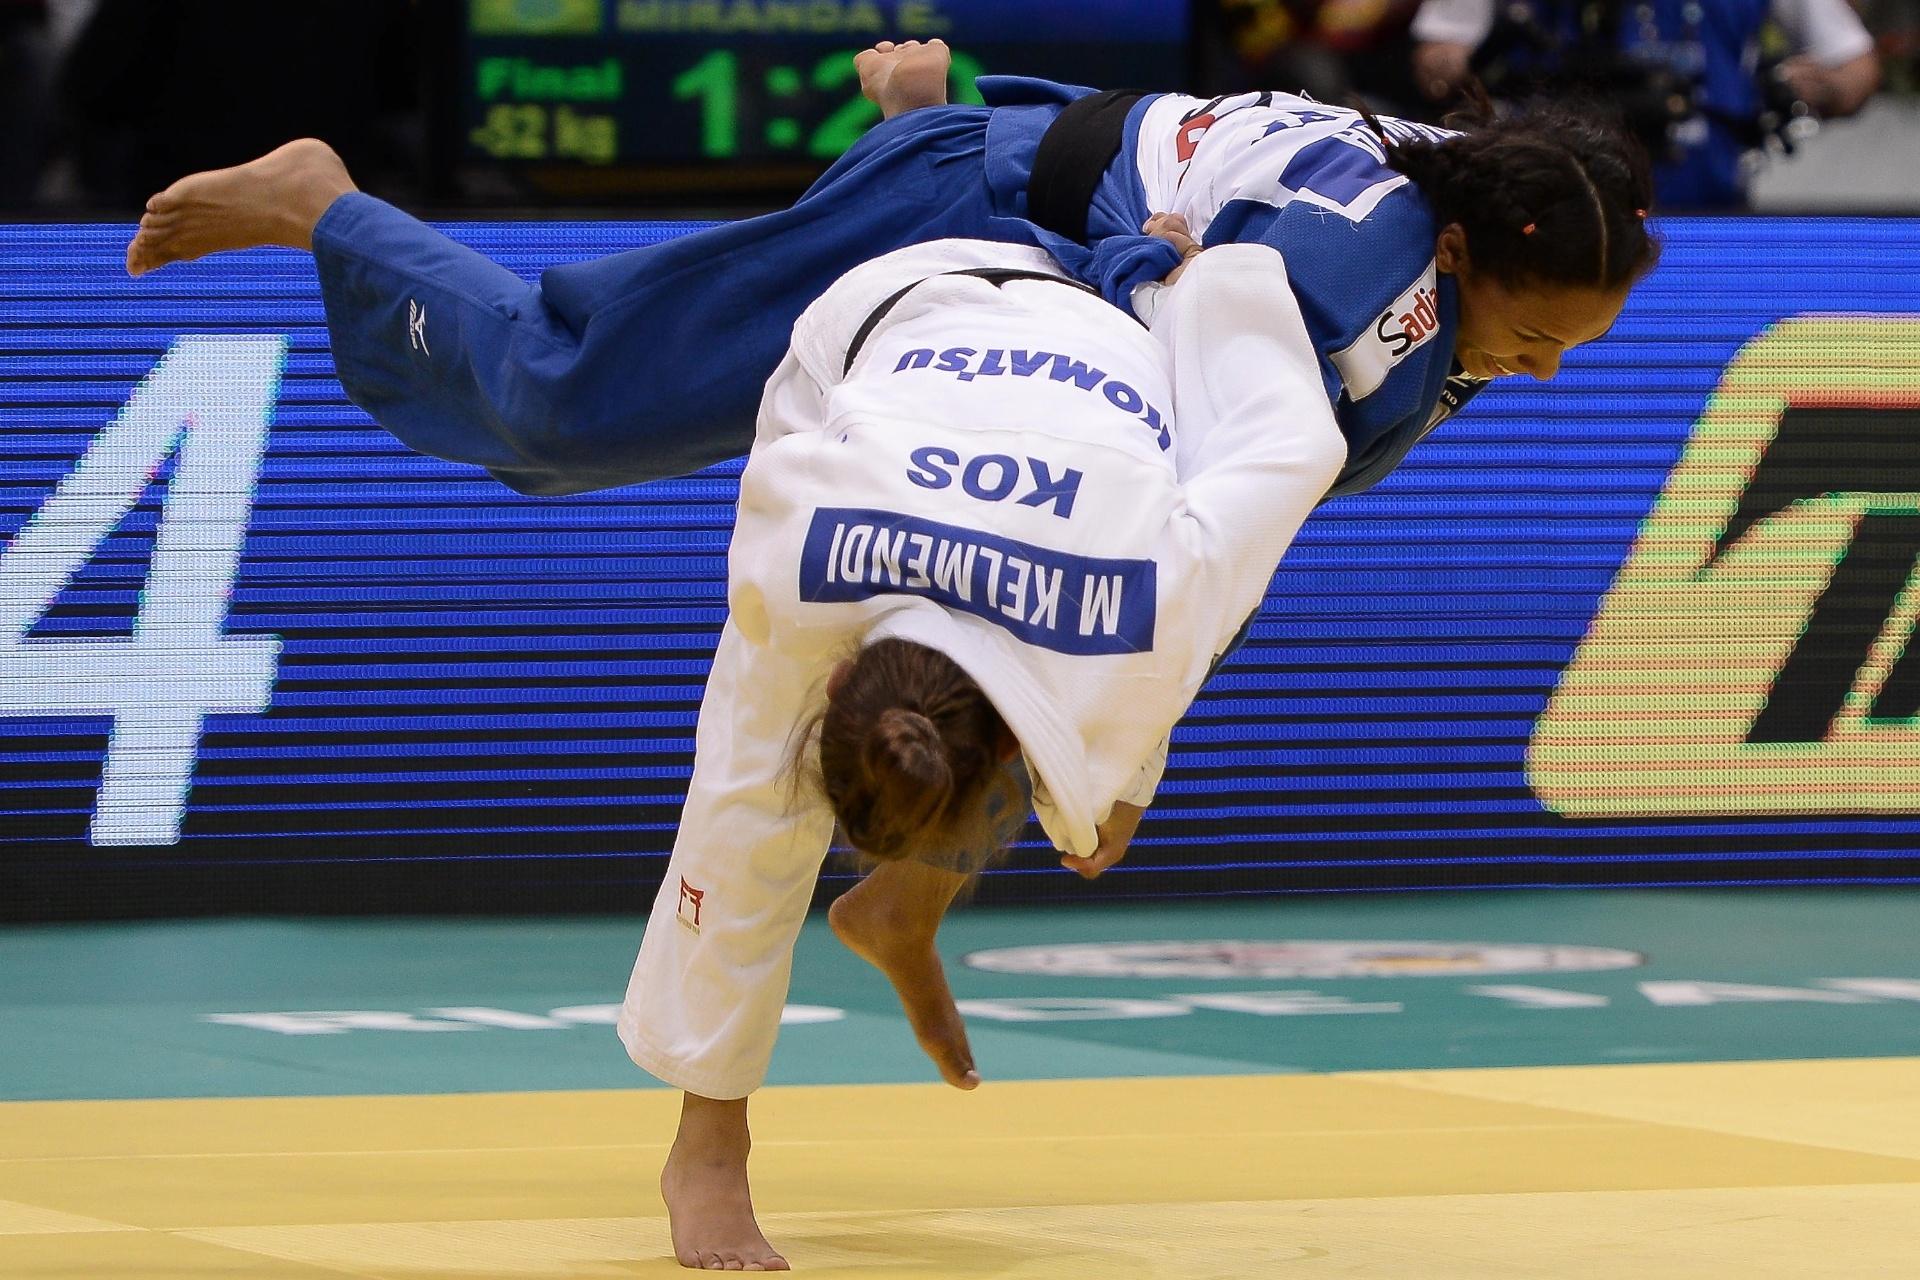 Majlinda Kelmendi bate a brasileira Erika Miranda no Mundial de Judô de 2013, no Rio de Janeiro